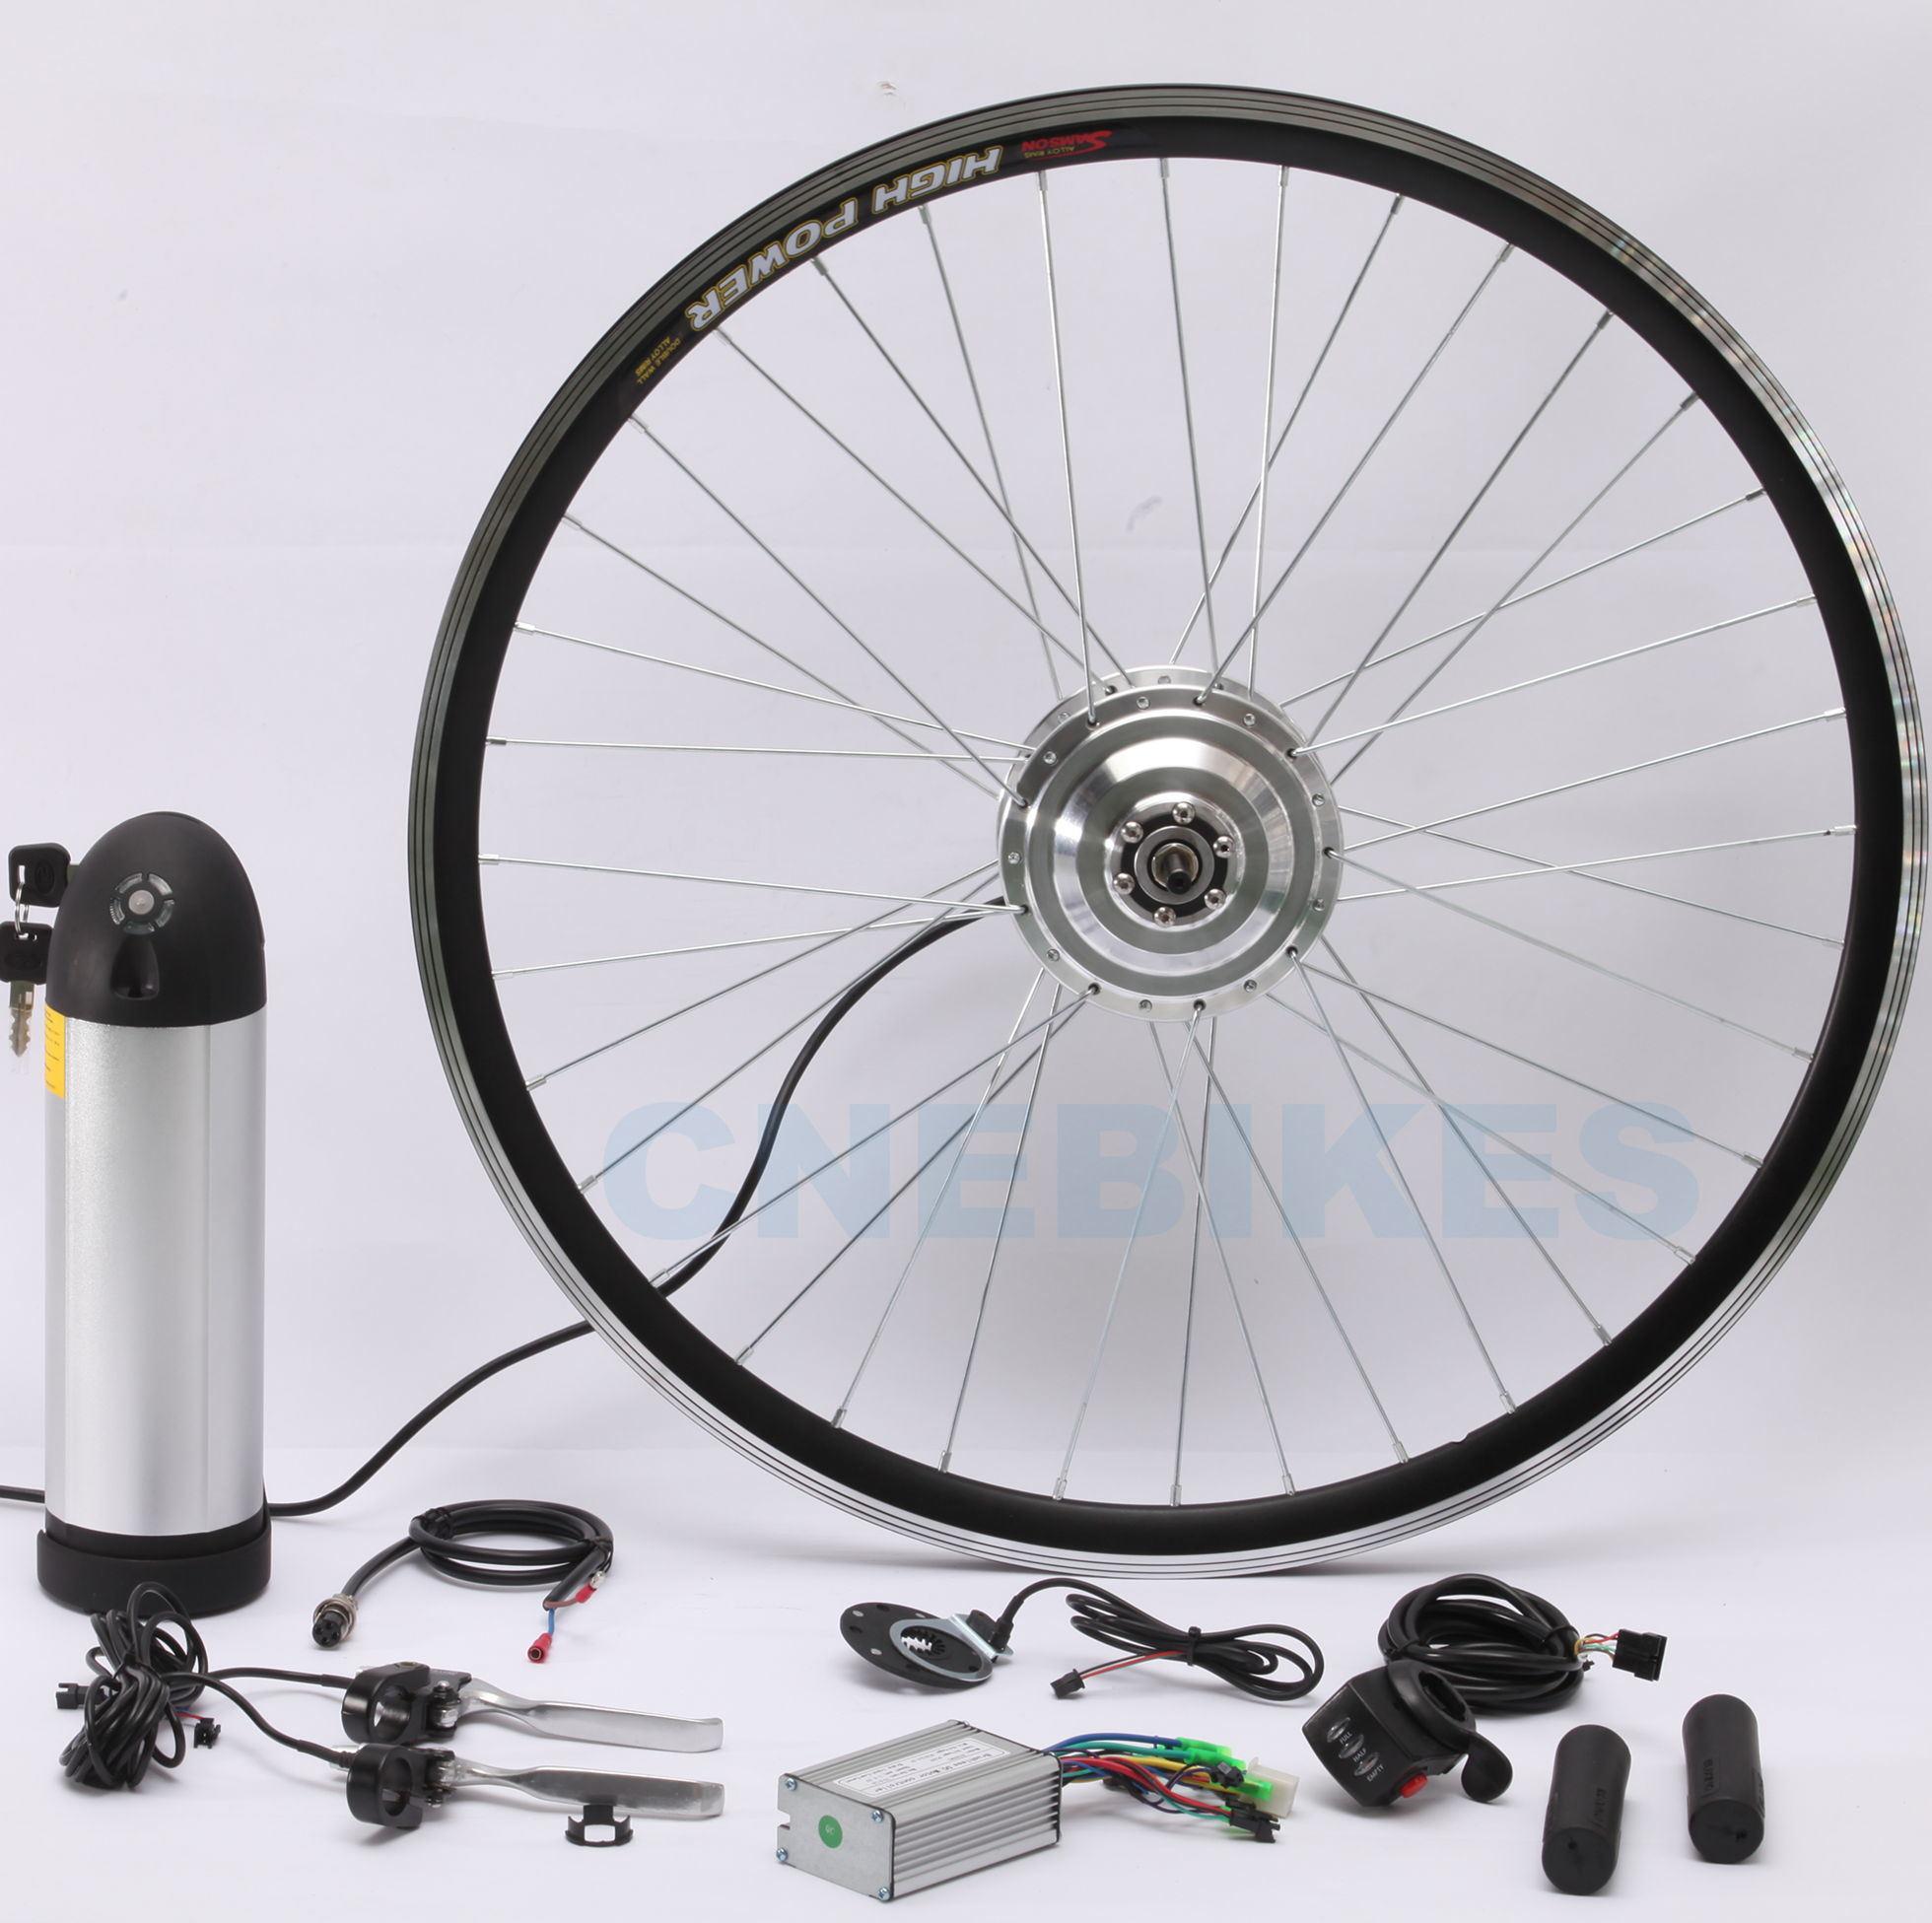 e-bike kit conversion